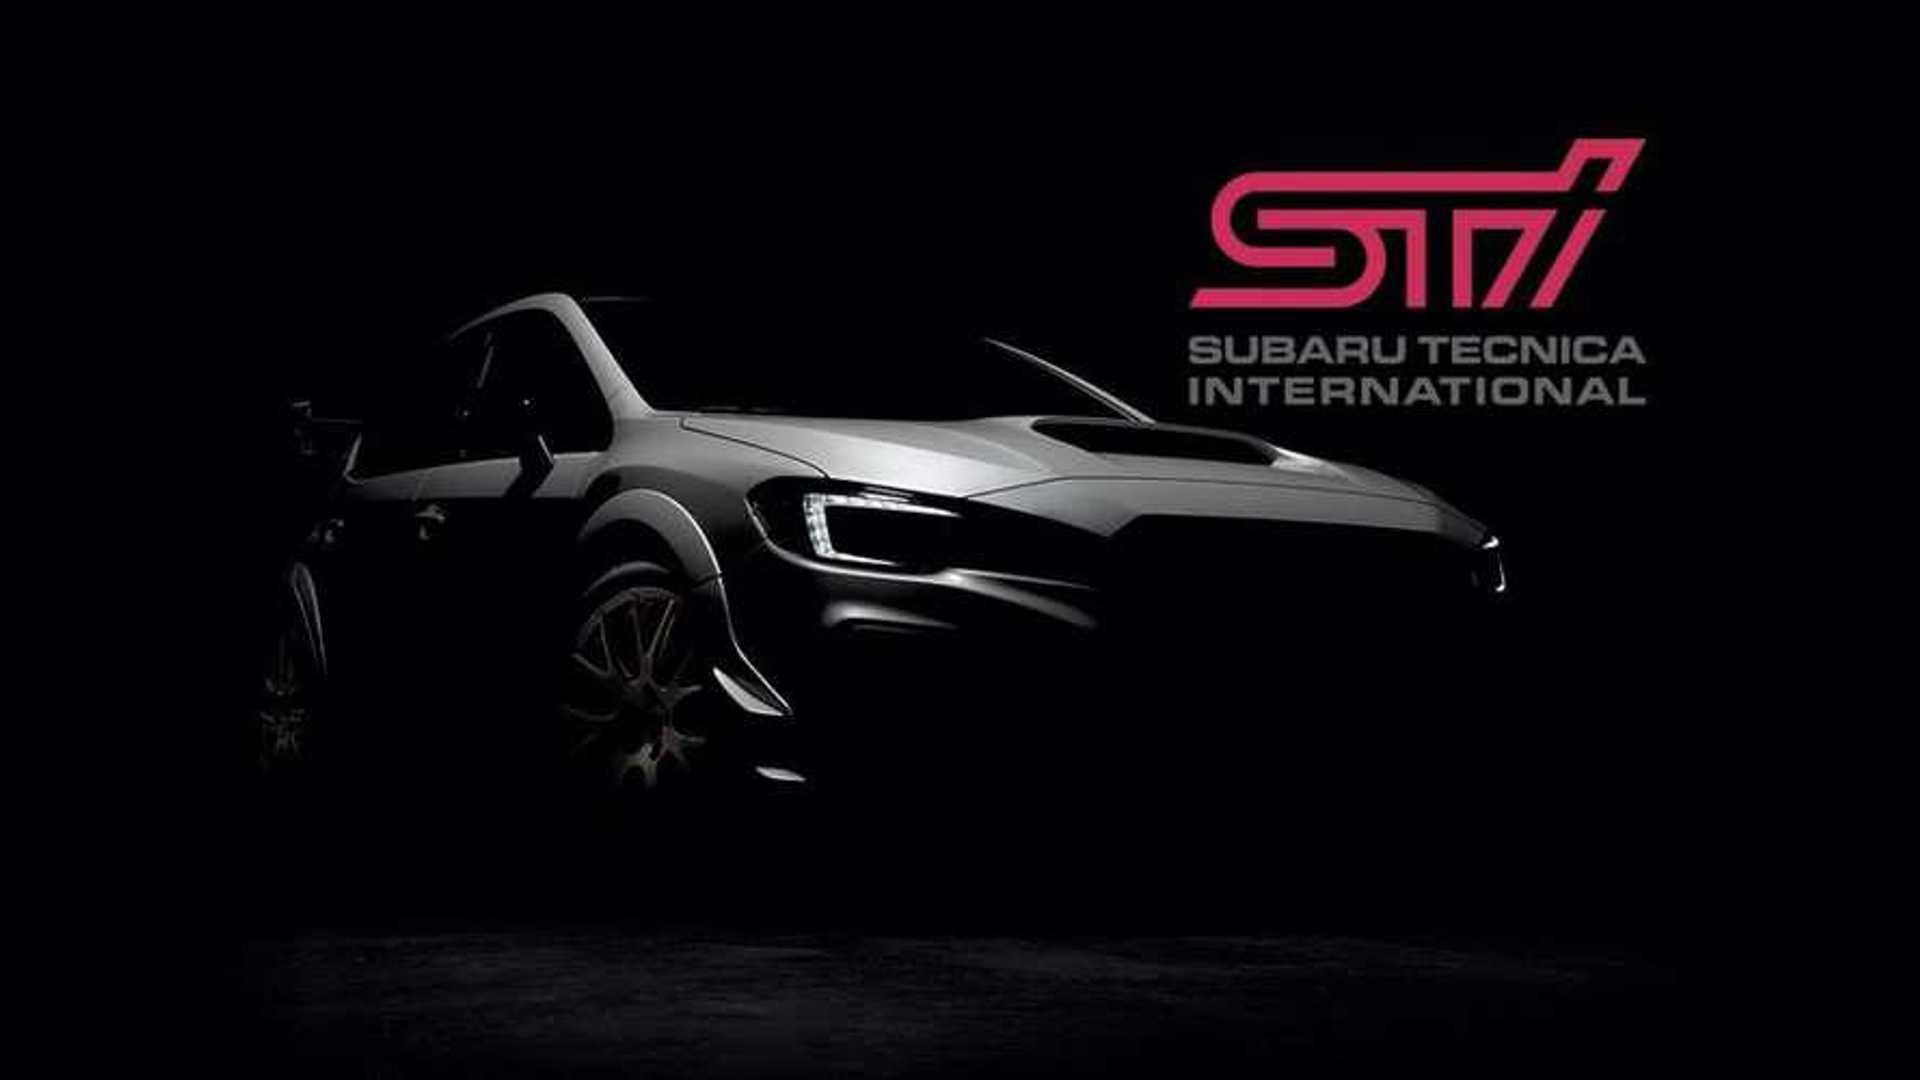 Subaru Wrx Sti S209 Debuts Today See The Livestream Update